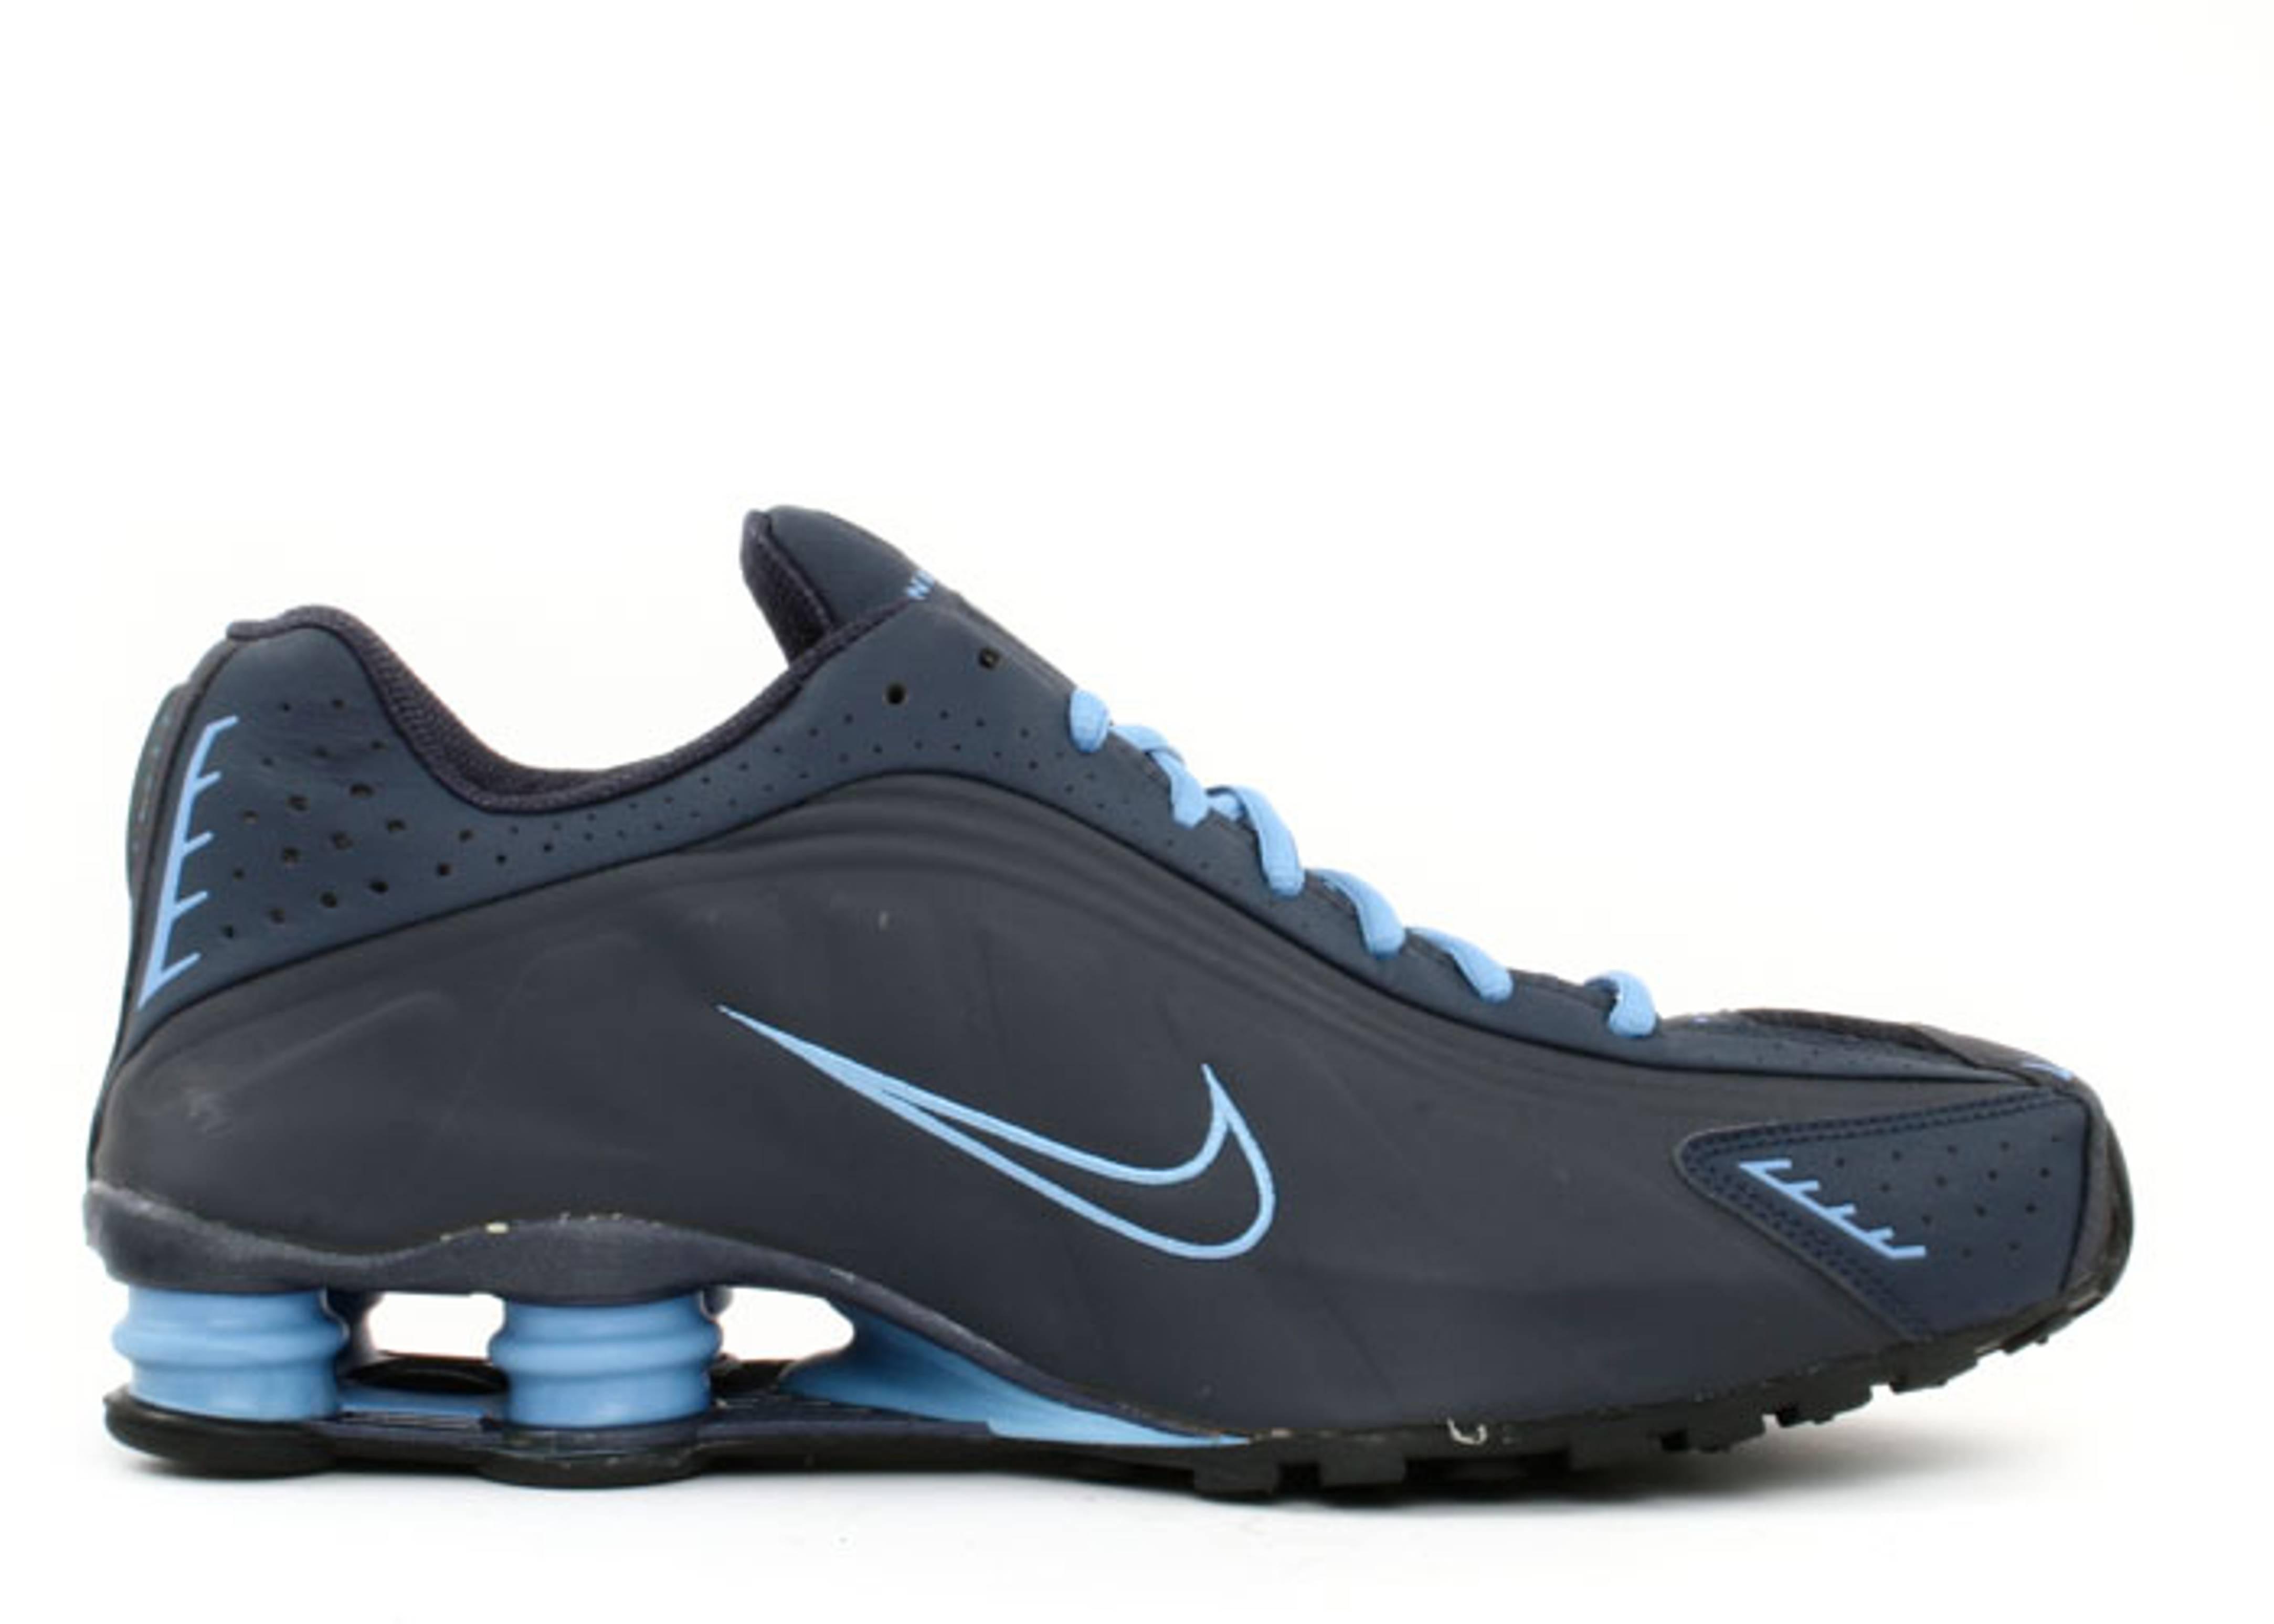 online store e3e37 0441a Shox R4 B - Nike - 302534 441 - obsidian columbia blue   Flight Club